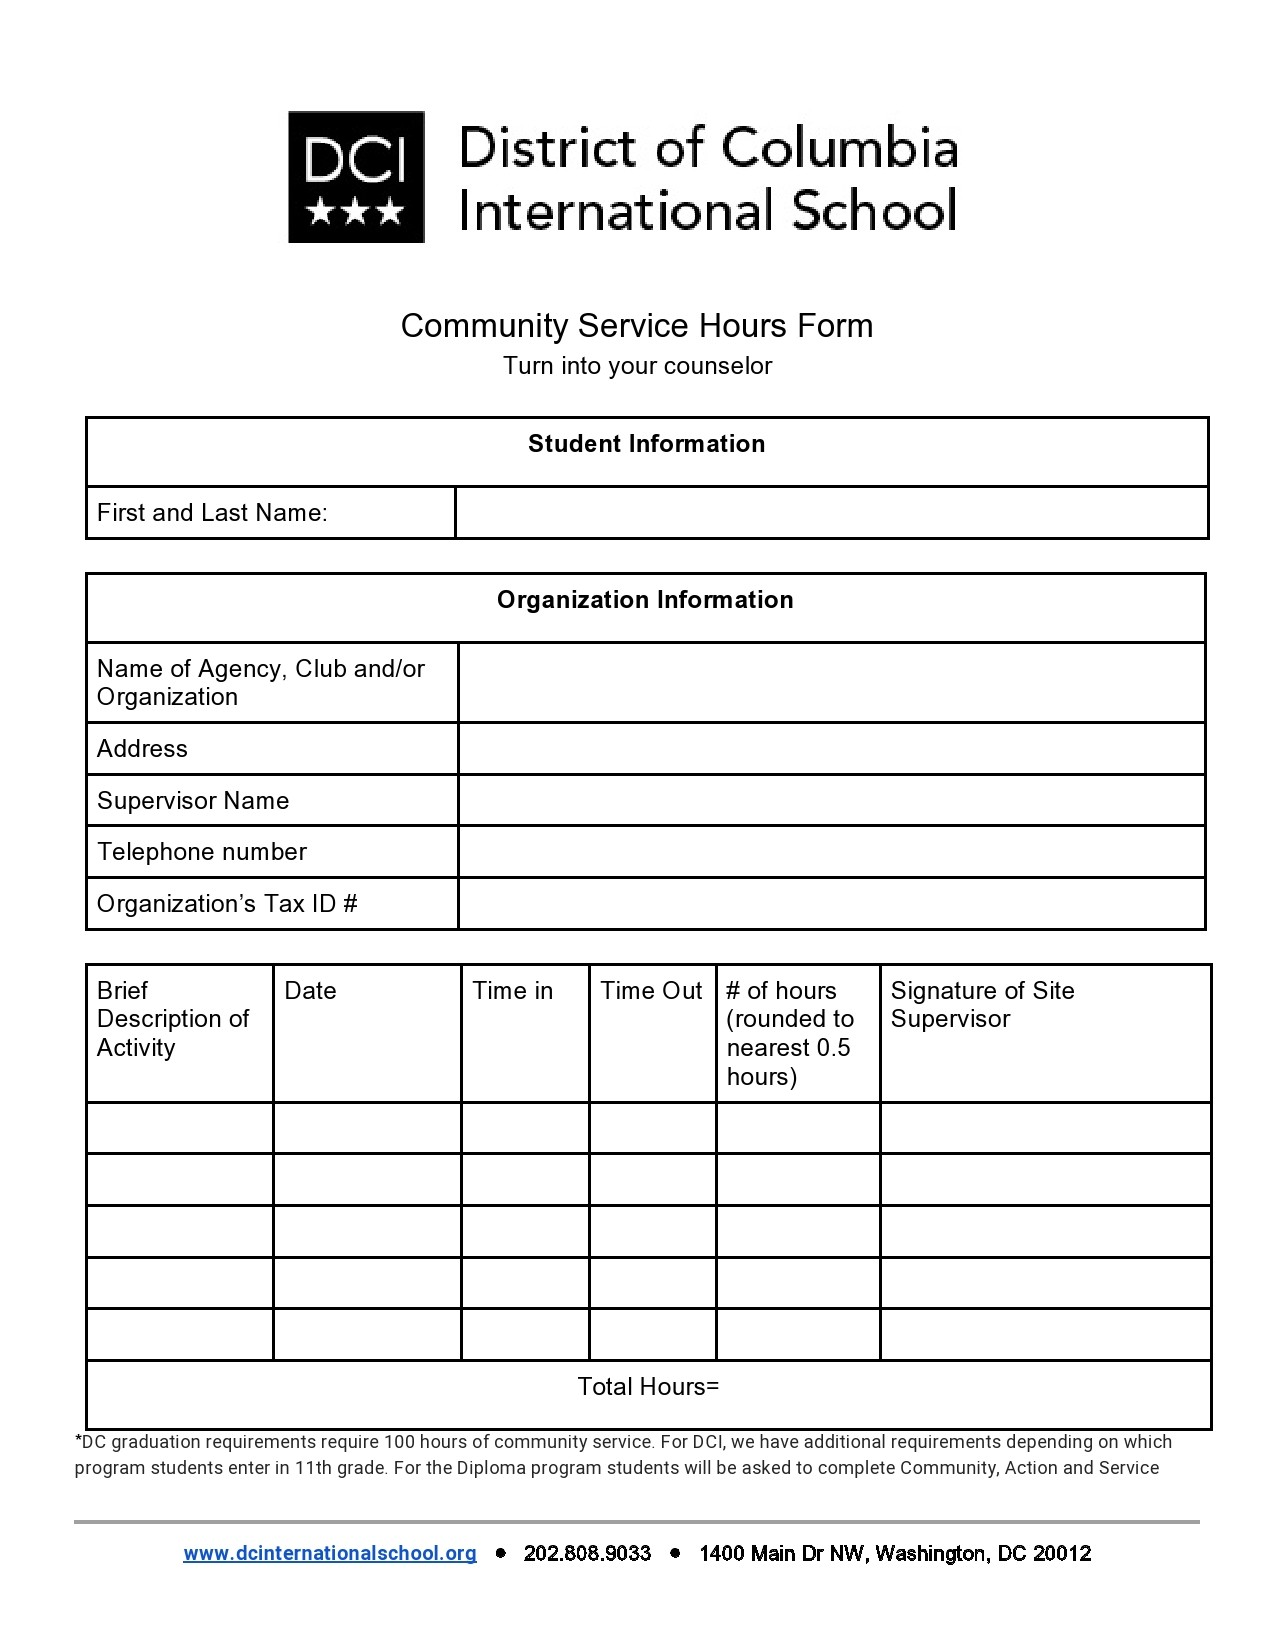 Free community service form 32